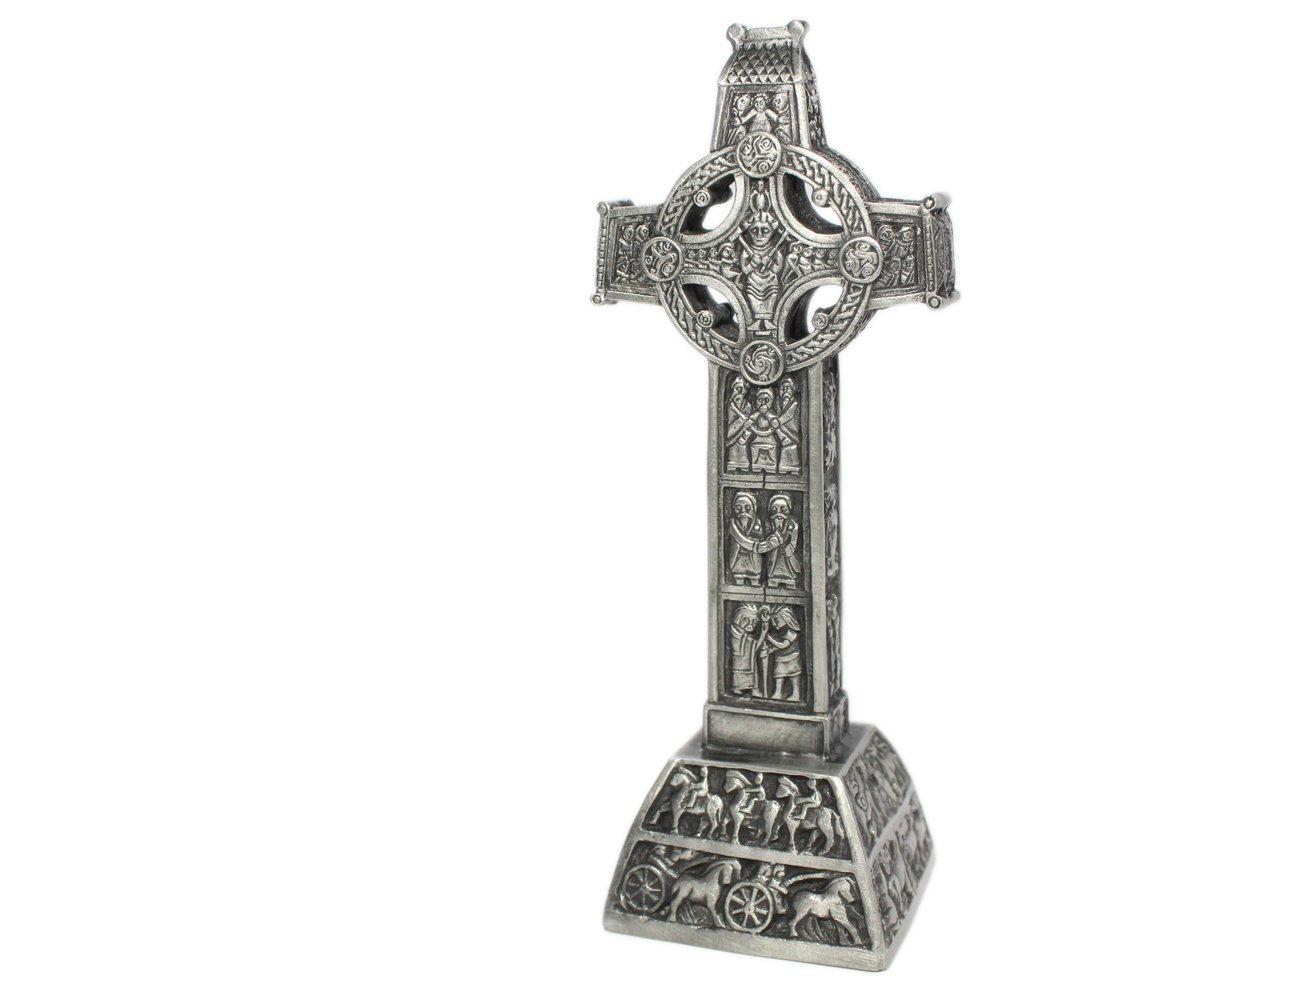 Carrolls Irish Gifts Mullingar Pewter Clonmacnoise Standing Cross